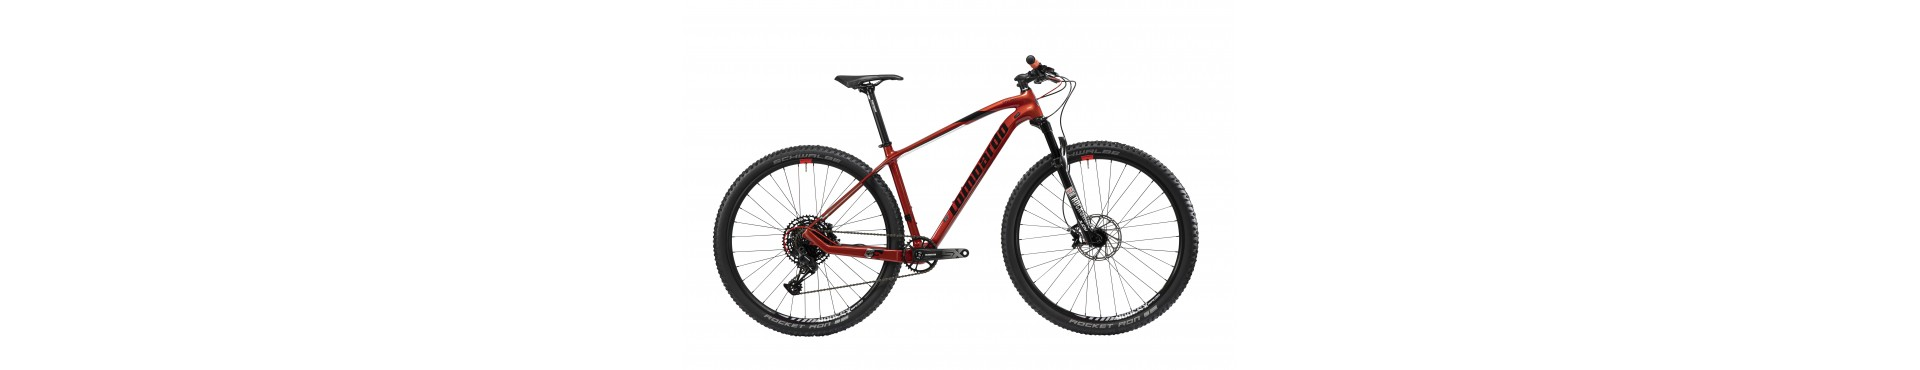 mountain bike front